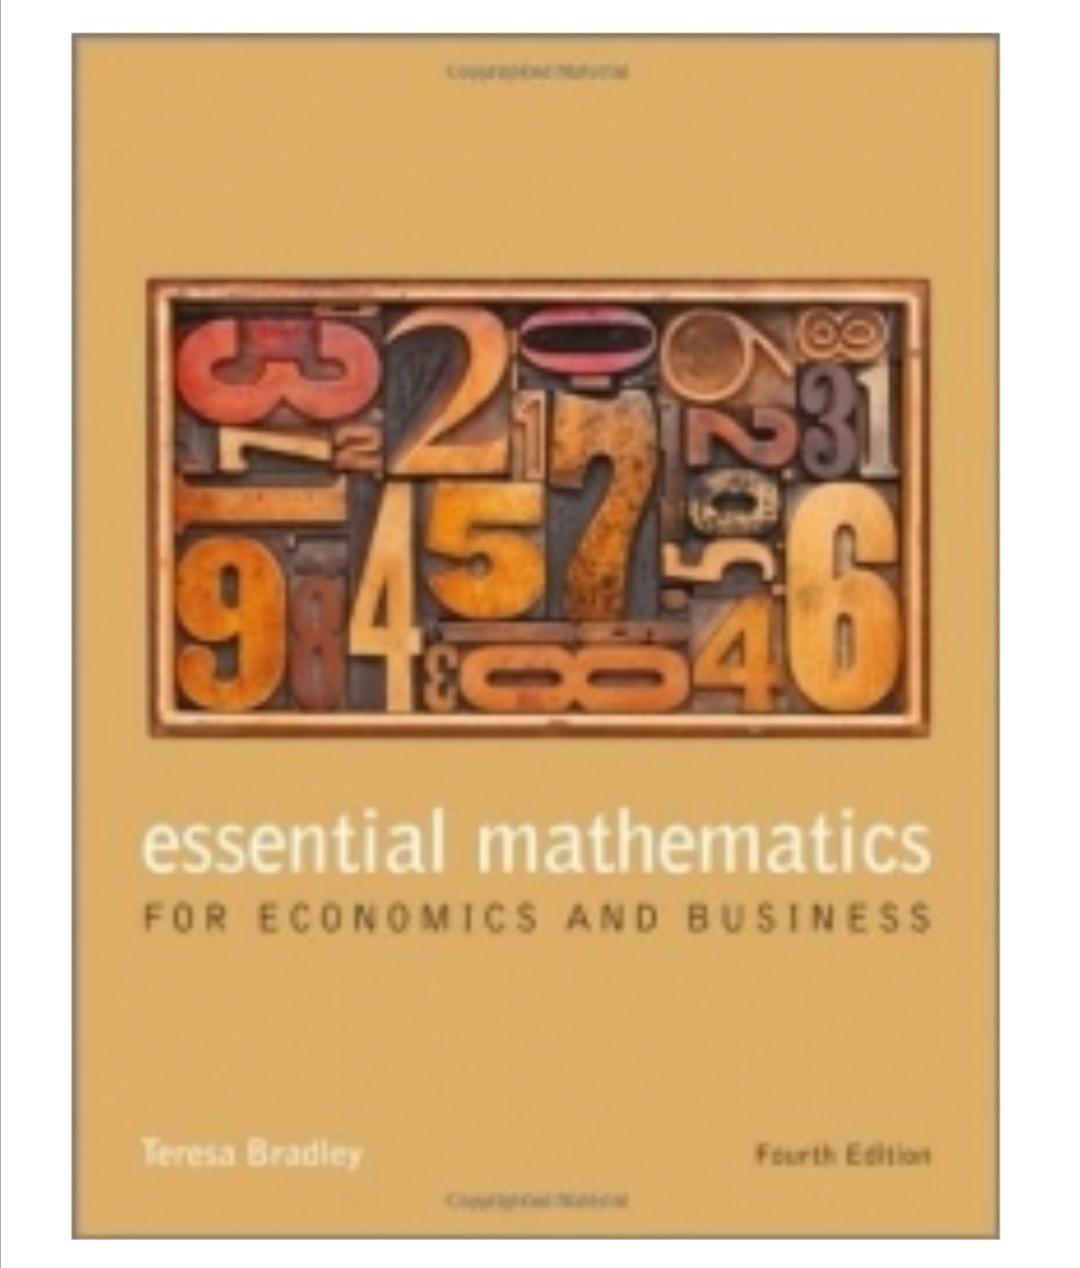 Unisa textbooks: MNB1501, DCS1520, FAC1502